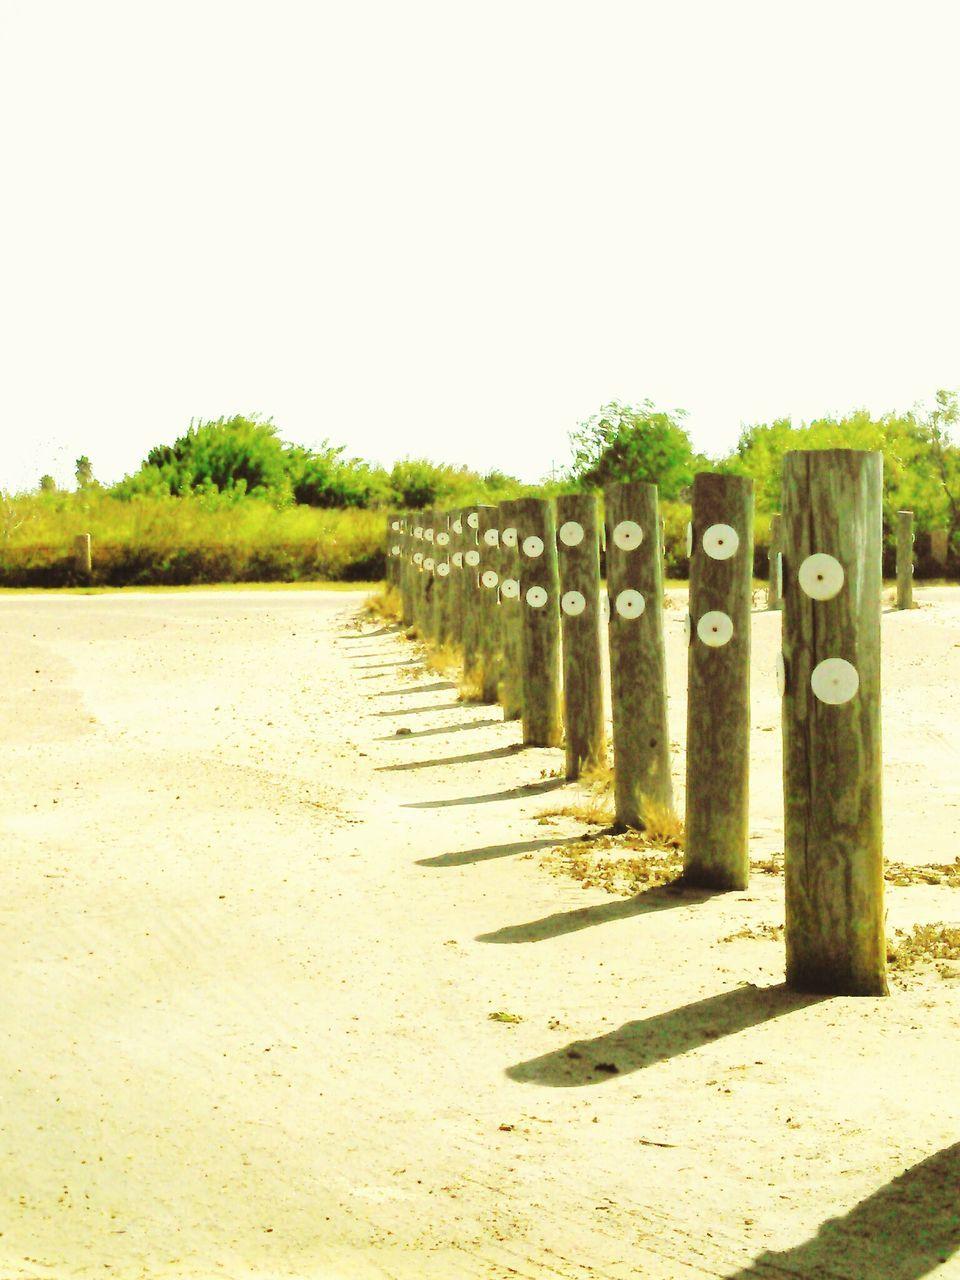 Wooden Post On Beach Against Clear Sky